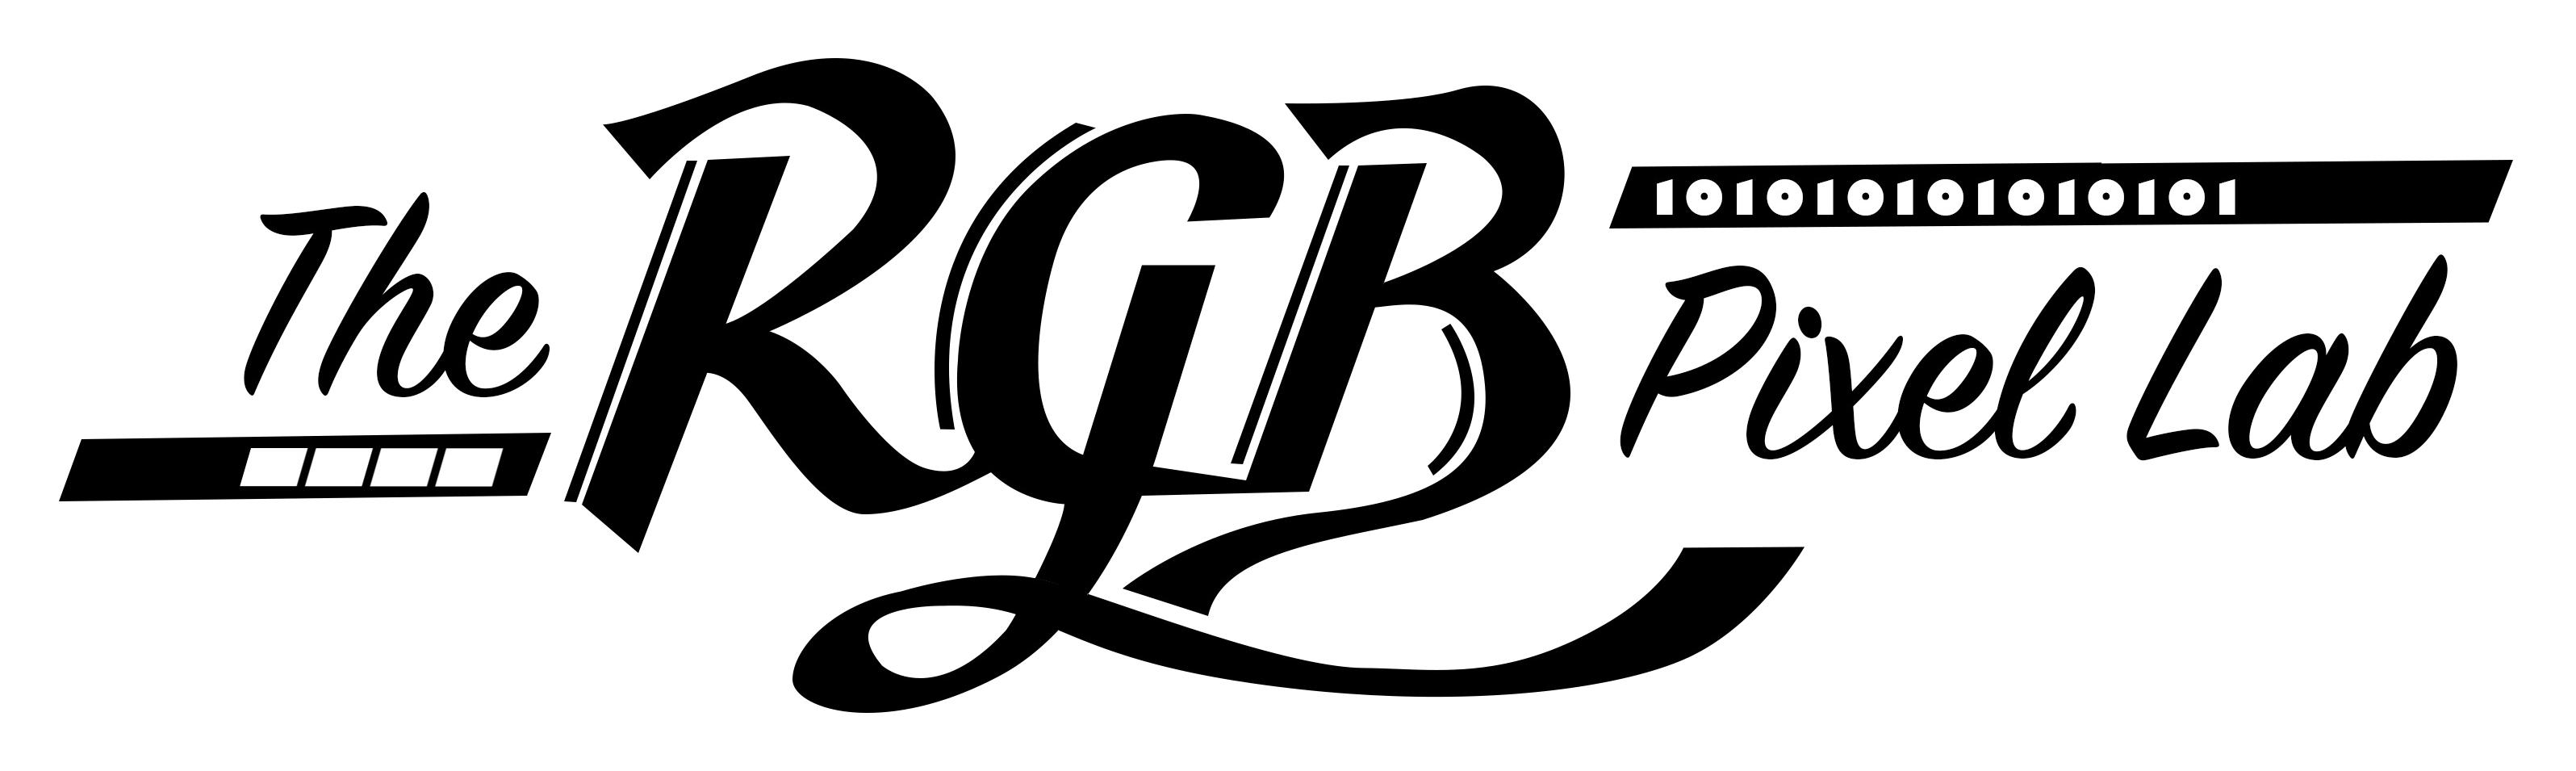 The_RGB_Pixellab_Logo